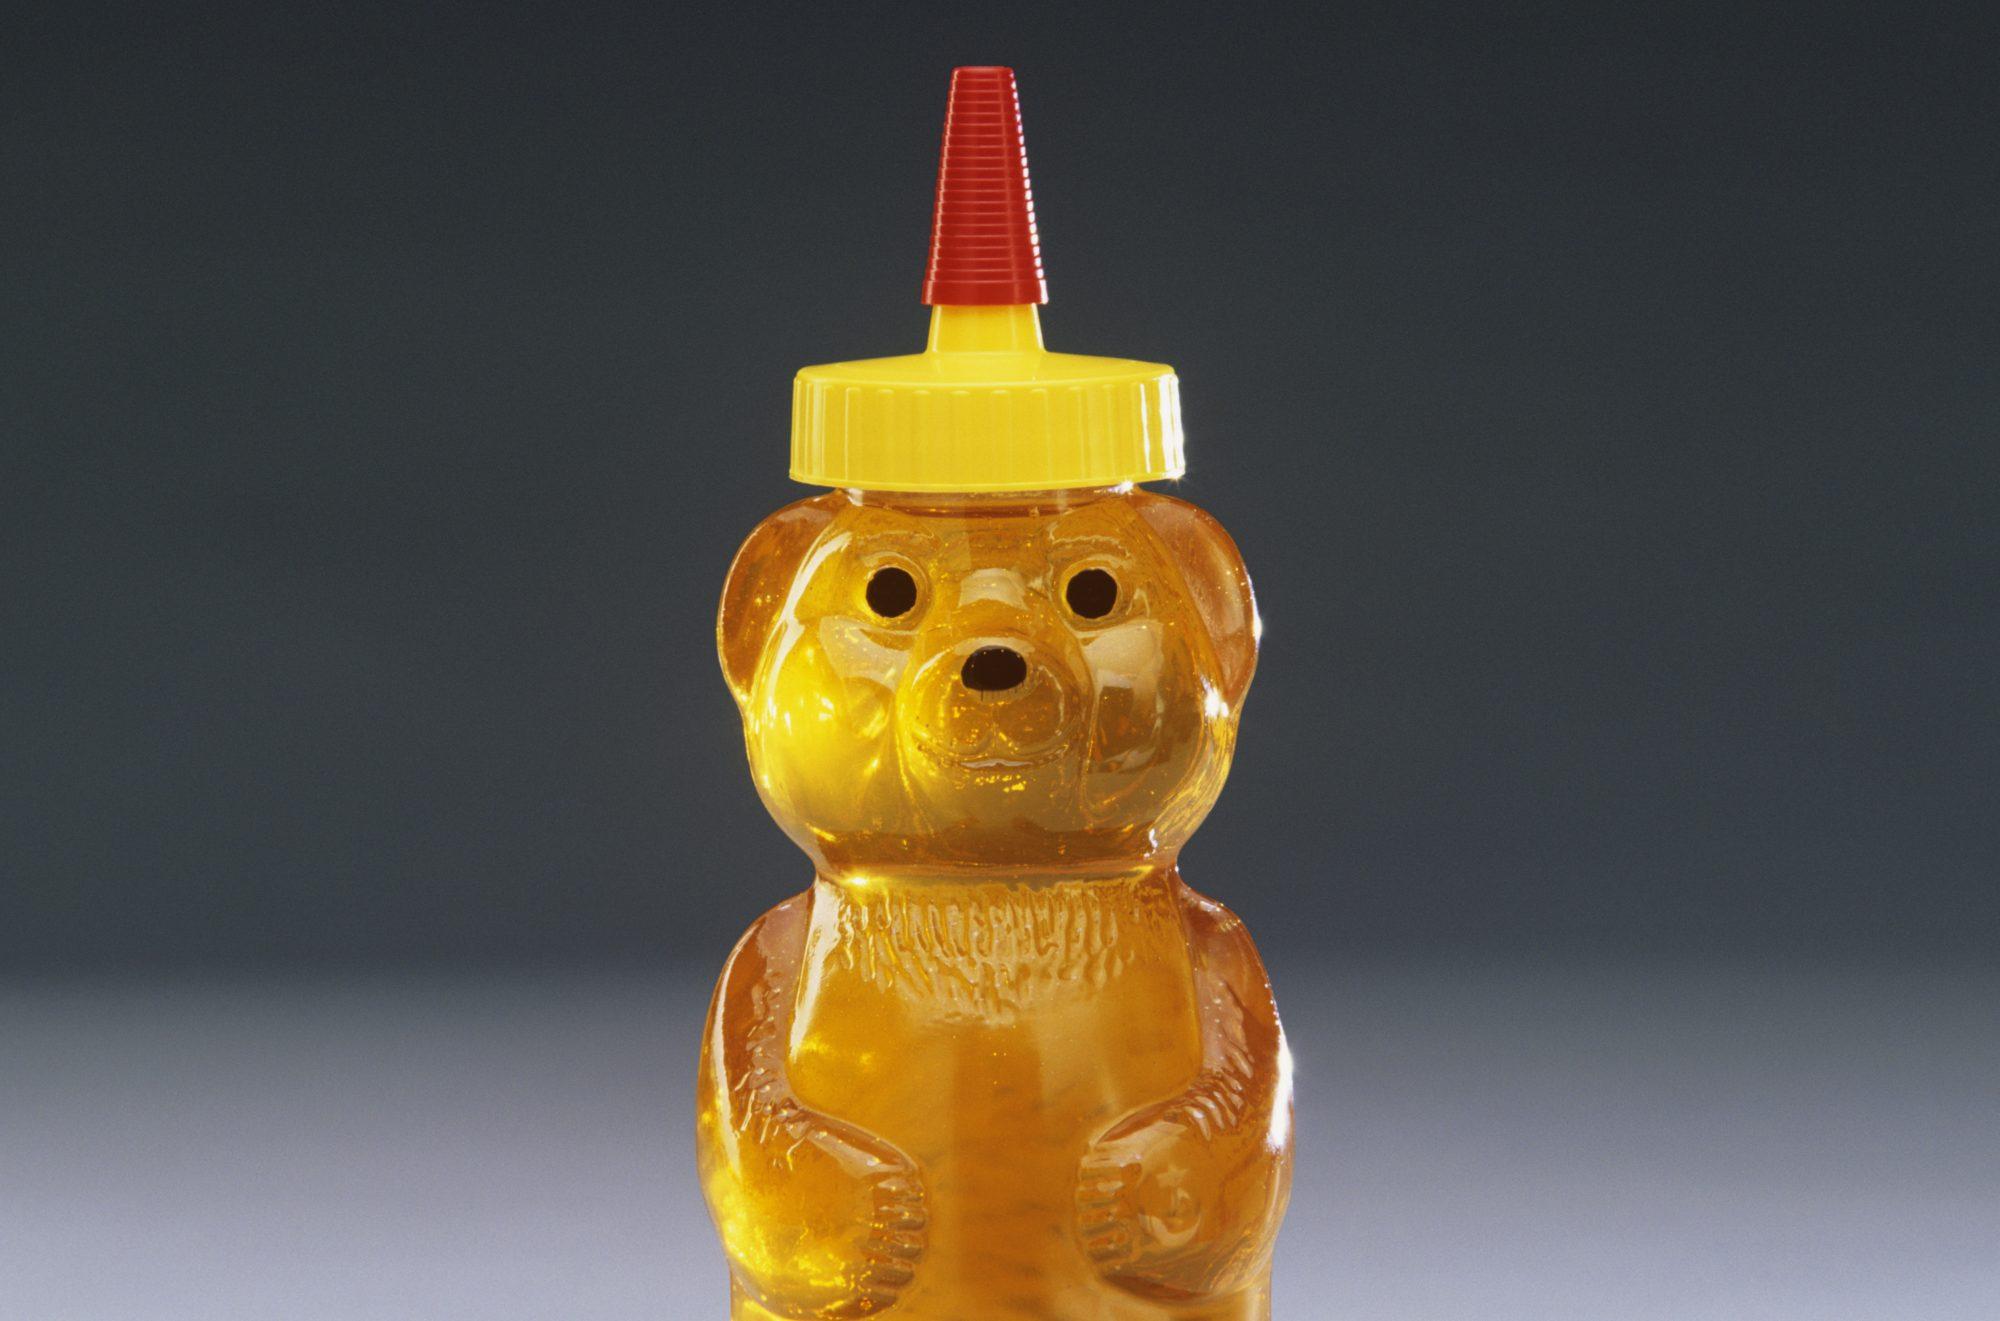 Honey bear Getty 9/21/20